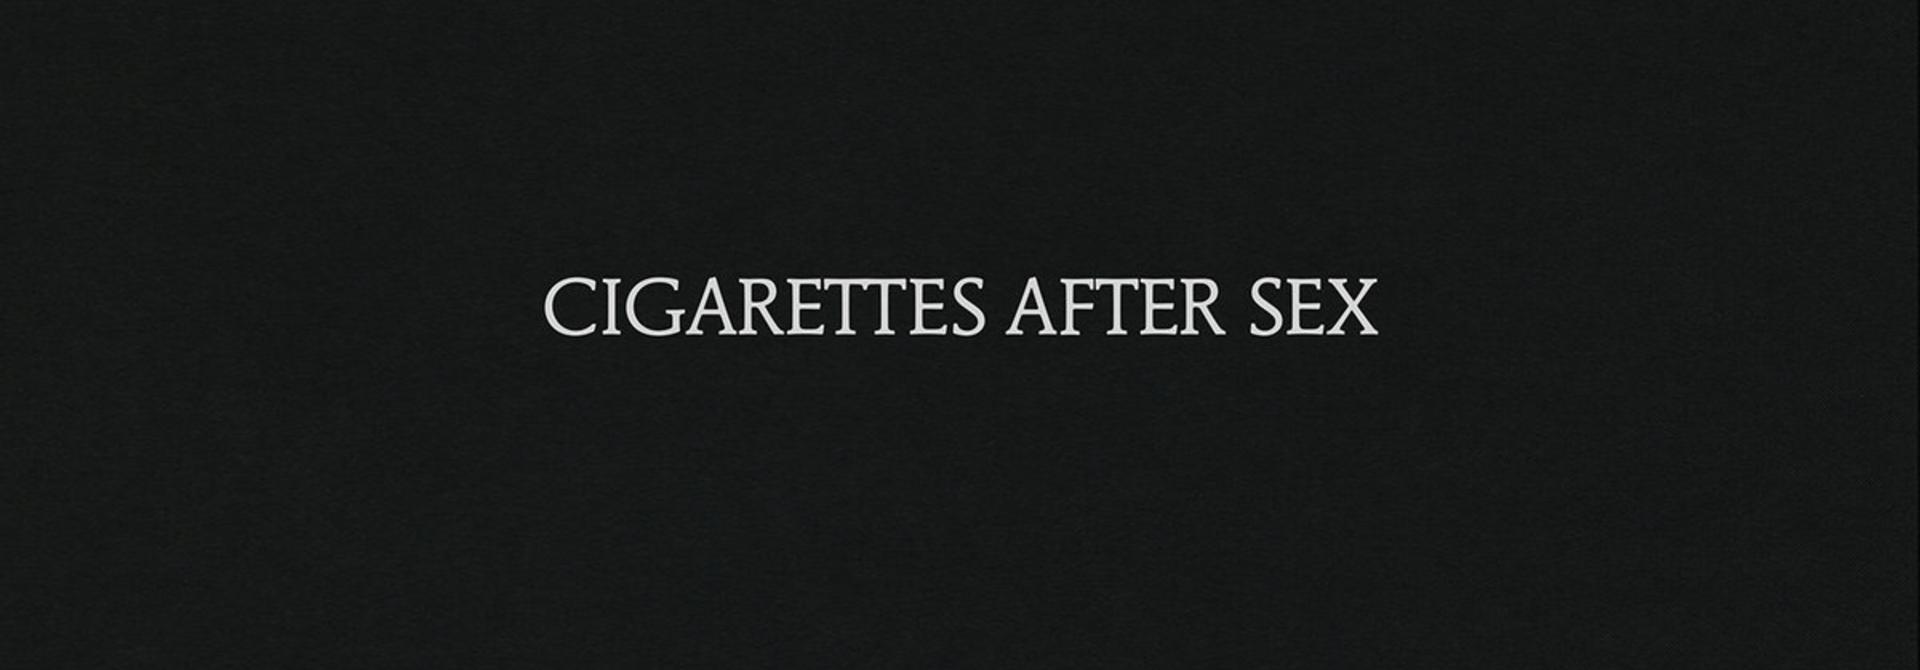 Cigarettes After Sex • Cigarettes After Sex